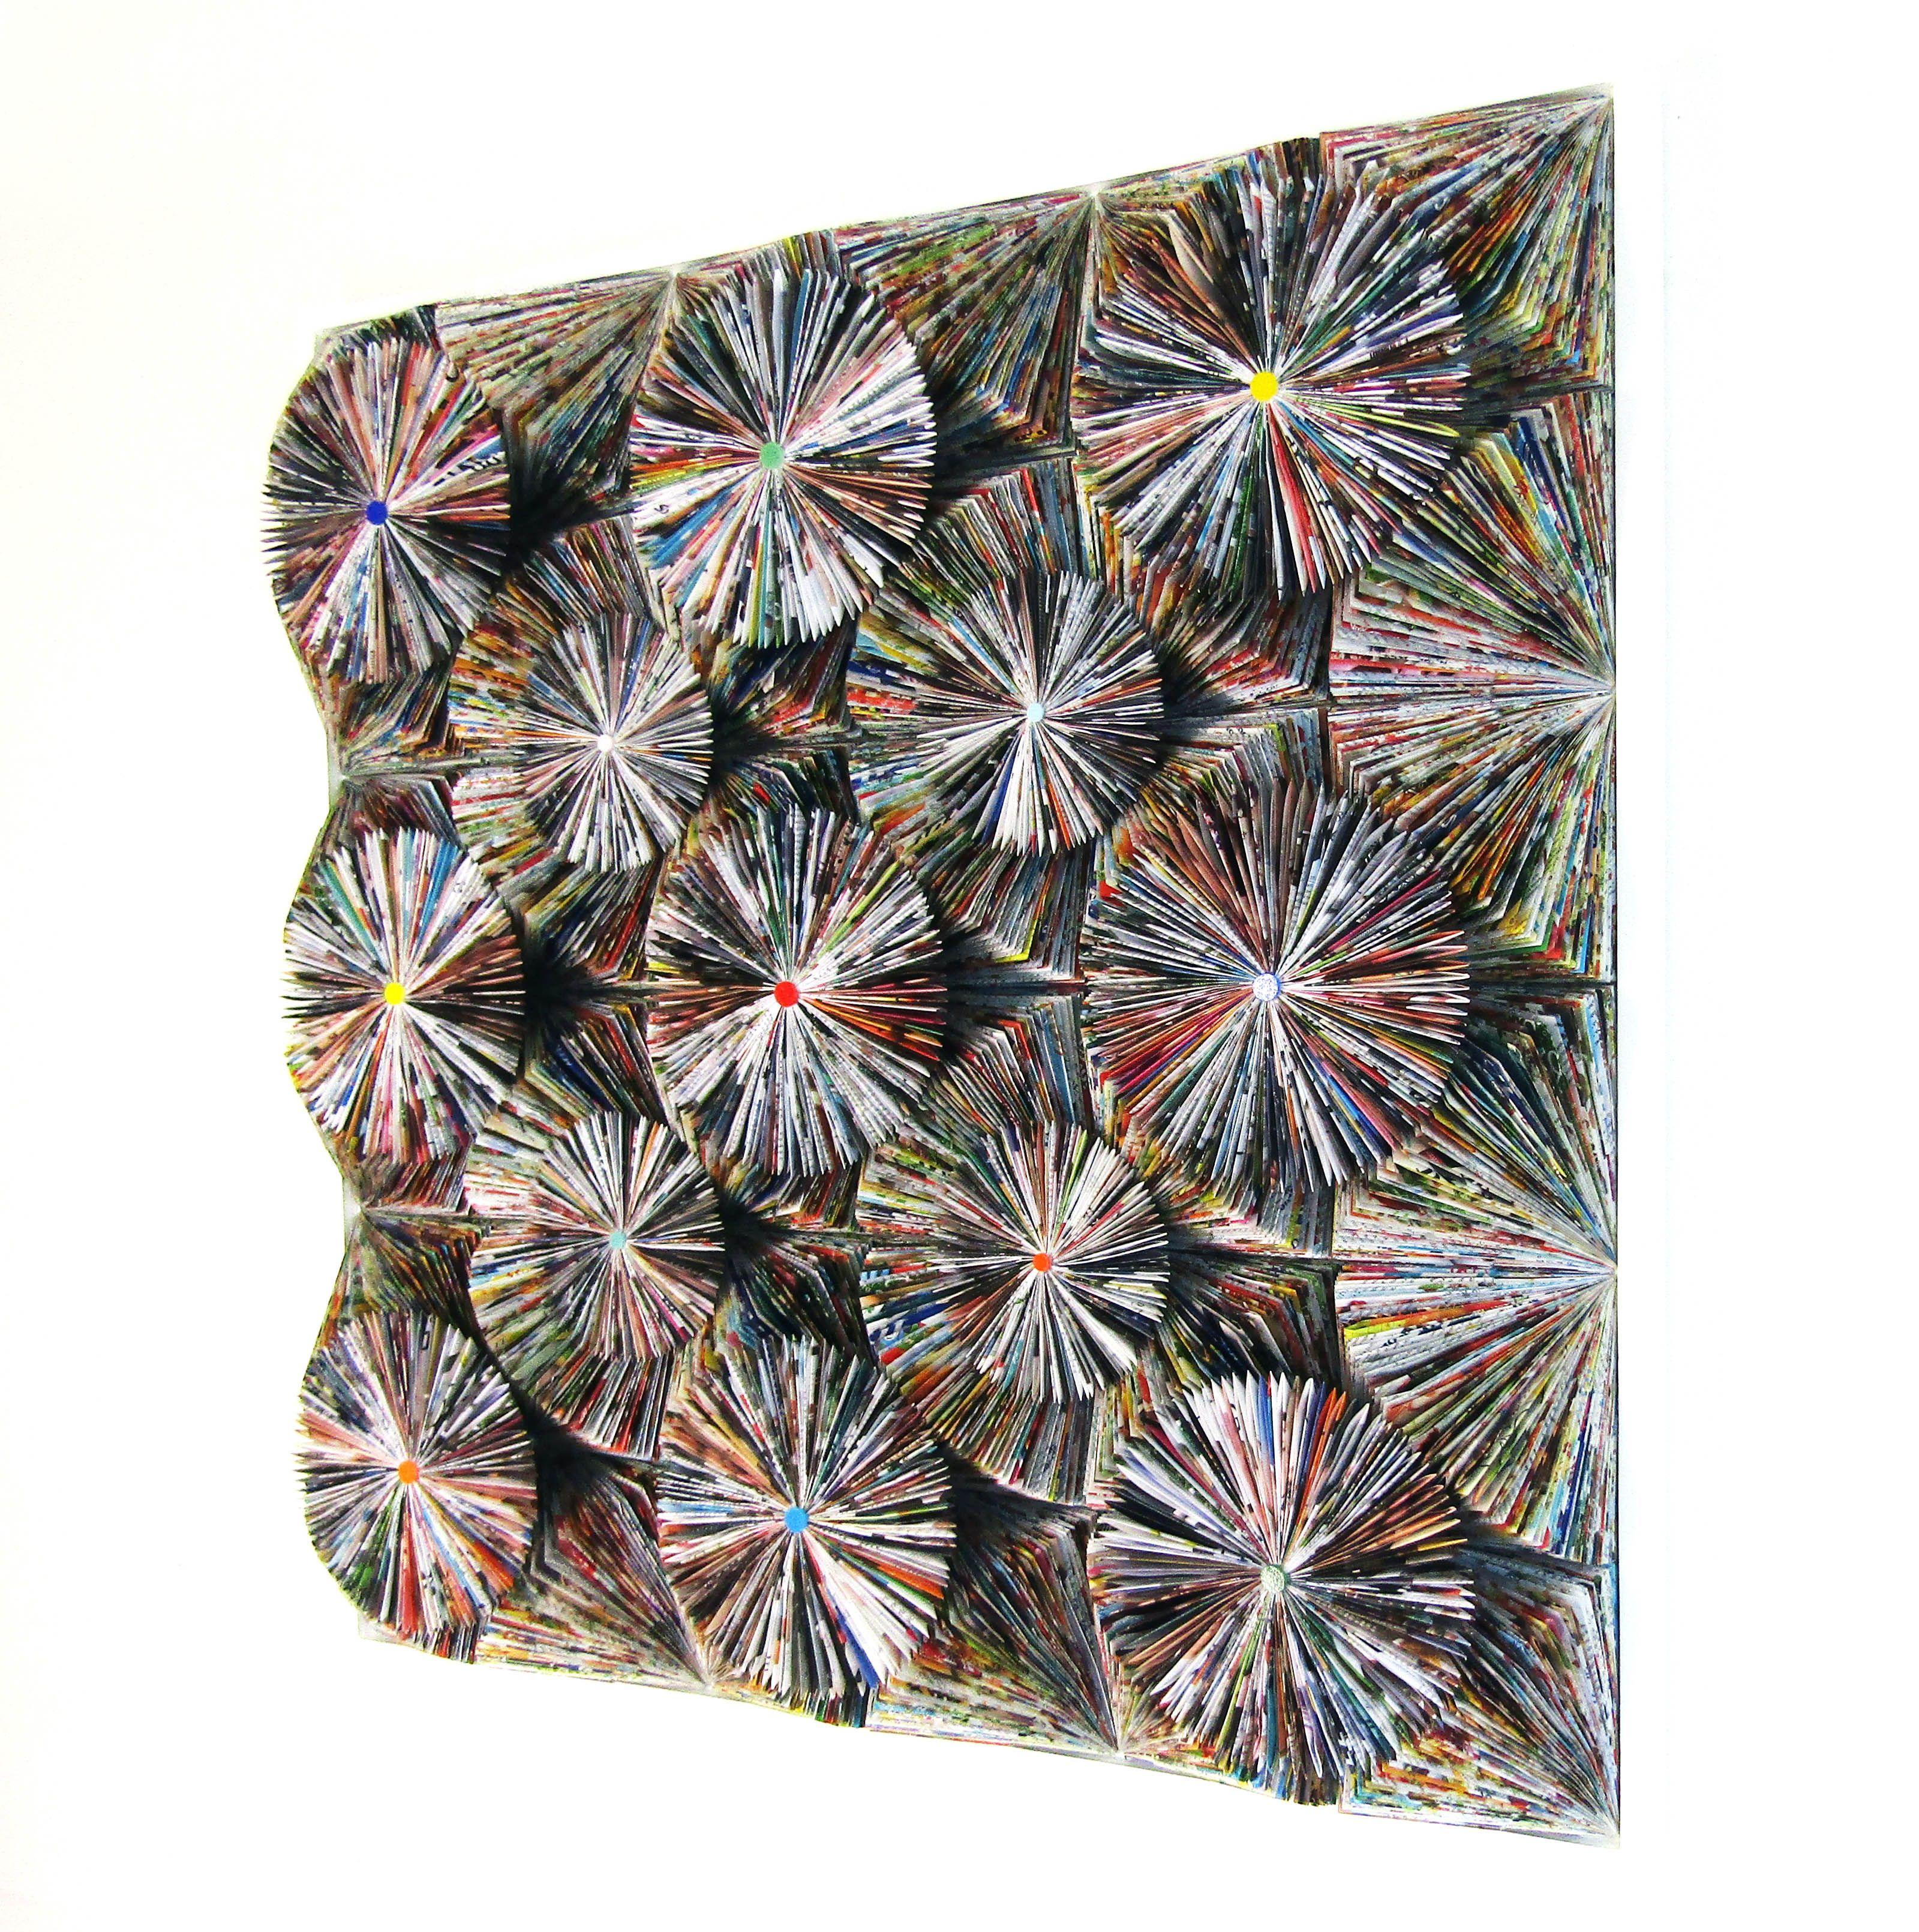 Lady D  Sculpted paper on wood panel   100 x 100 x 15 cm